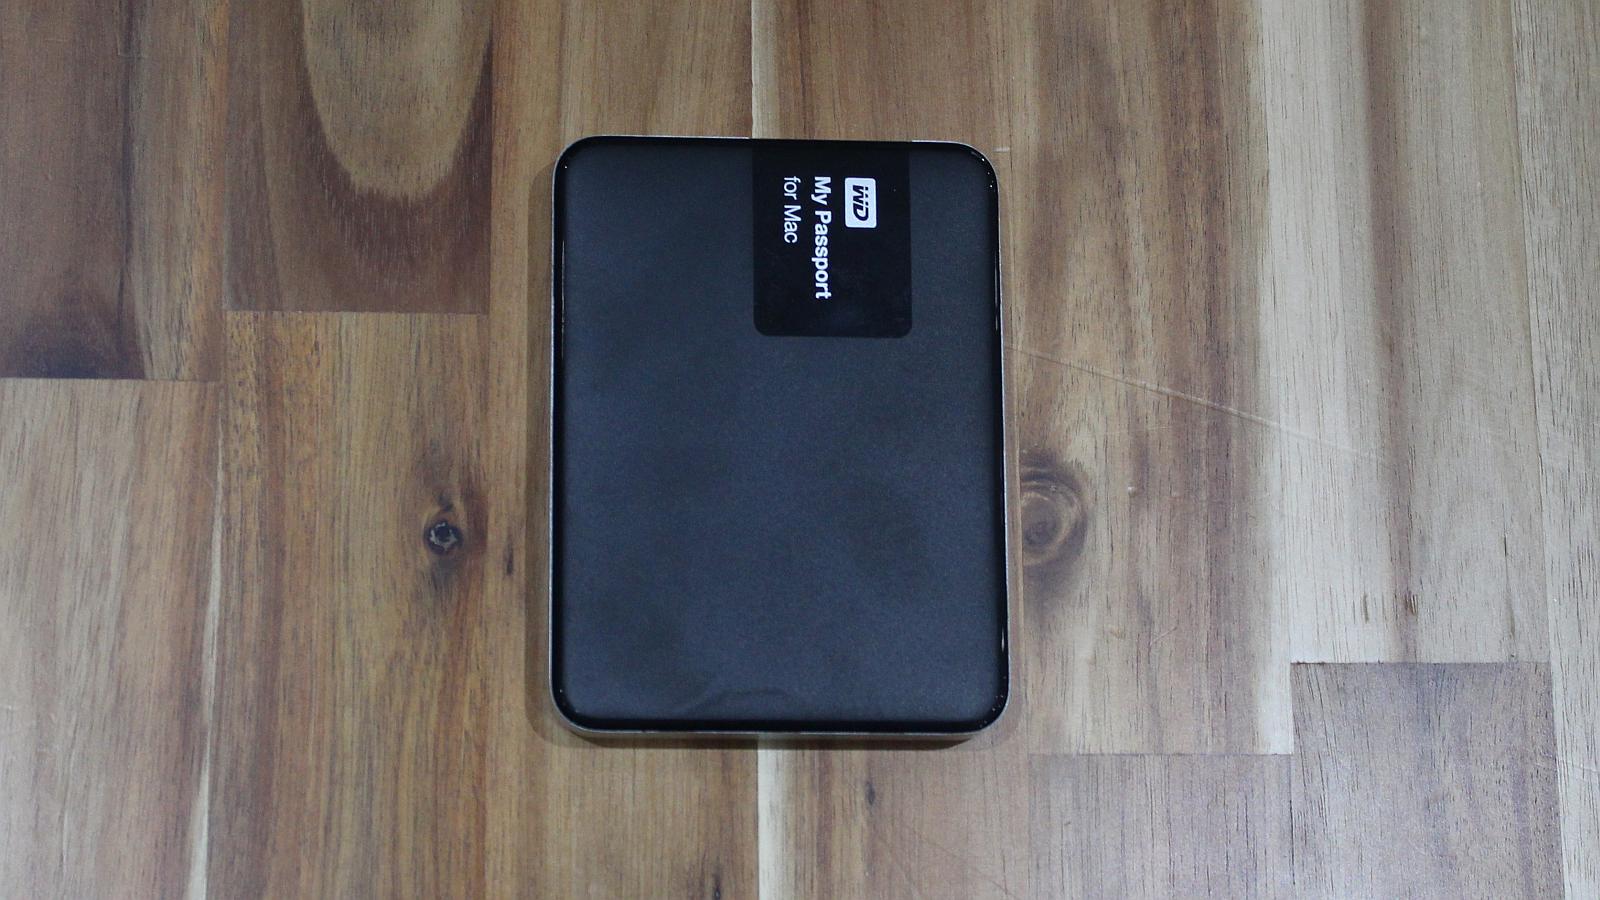 WD My Passport for Mac 1